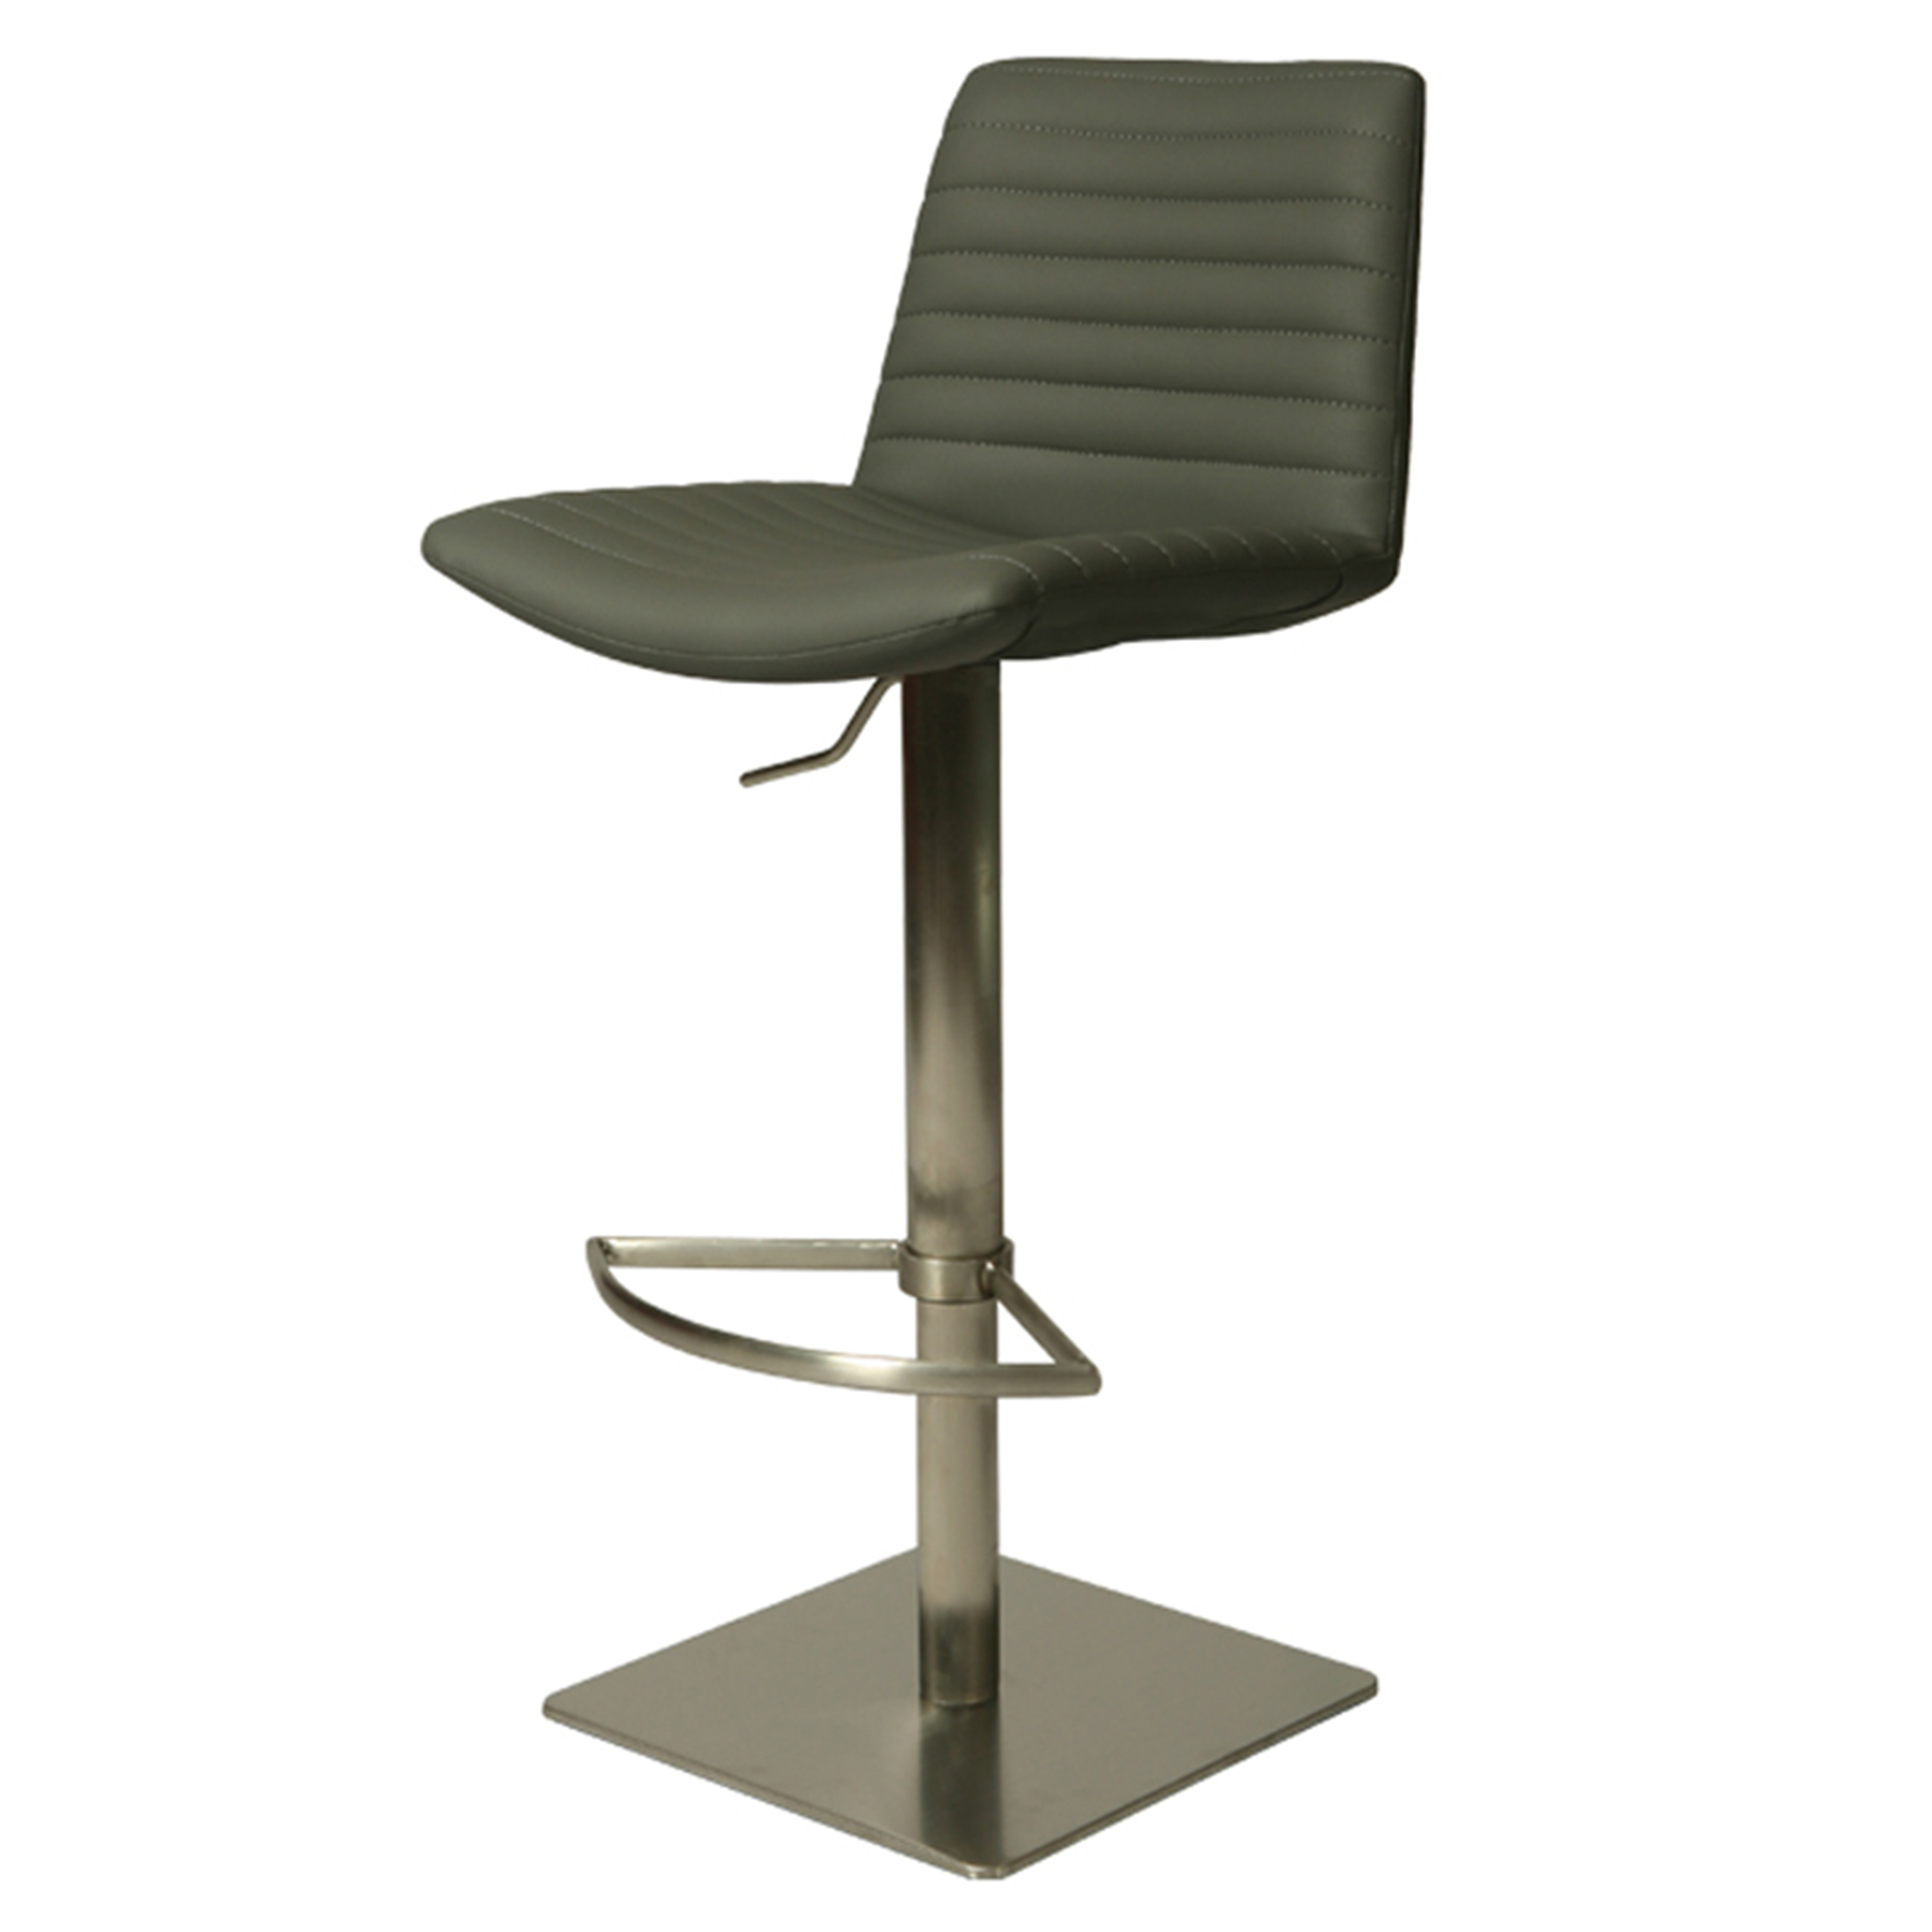 Glass Wood Dining Table, Quinn Bar Stool Bar Stools Dining Room Chairs Bar Stools Dining Room Furniture Z Gallerie